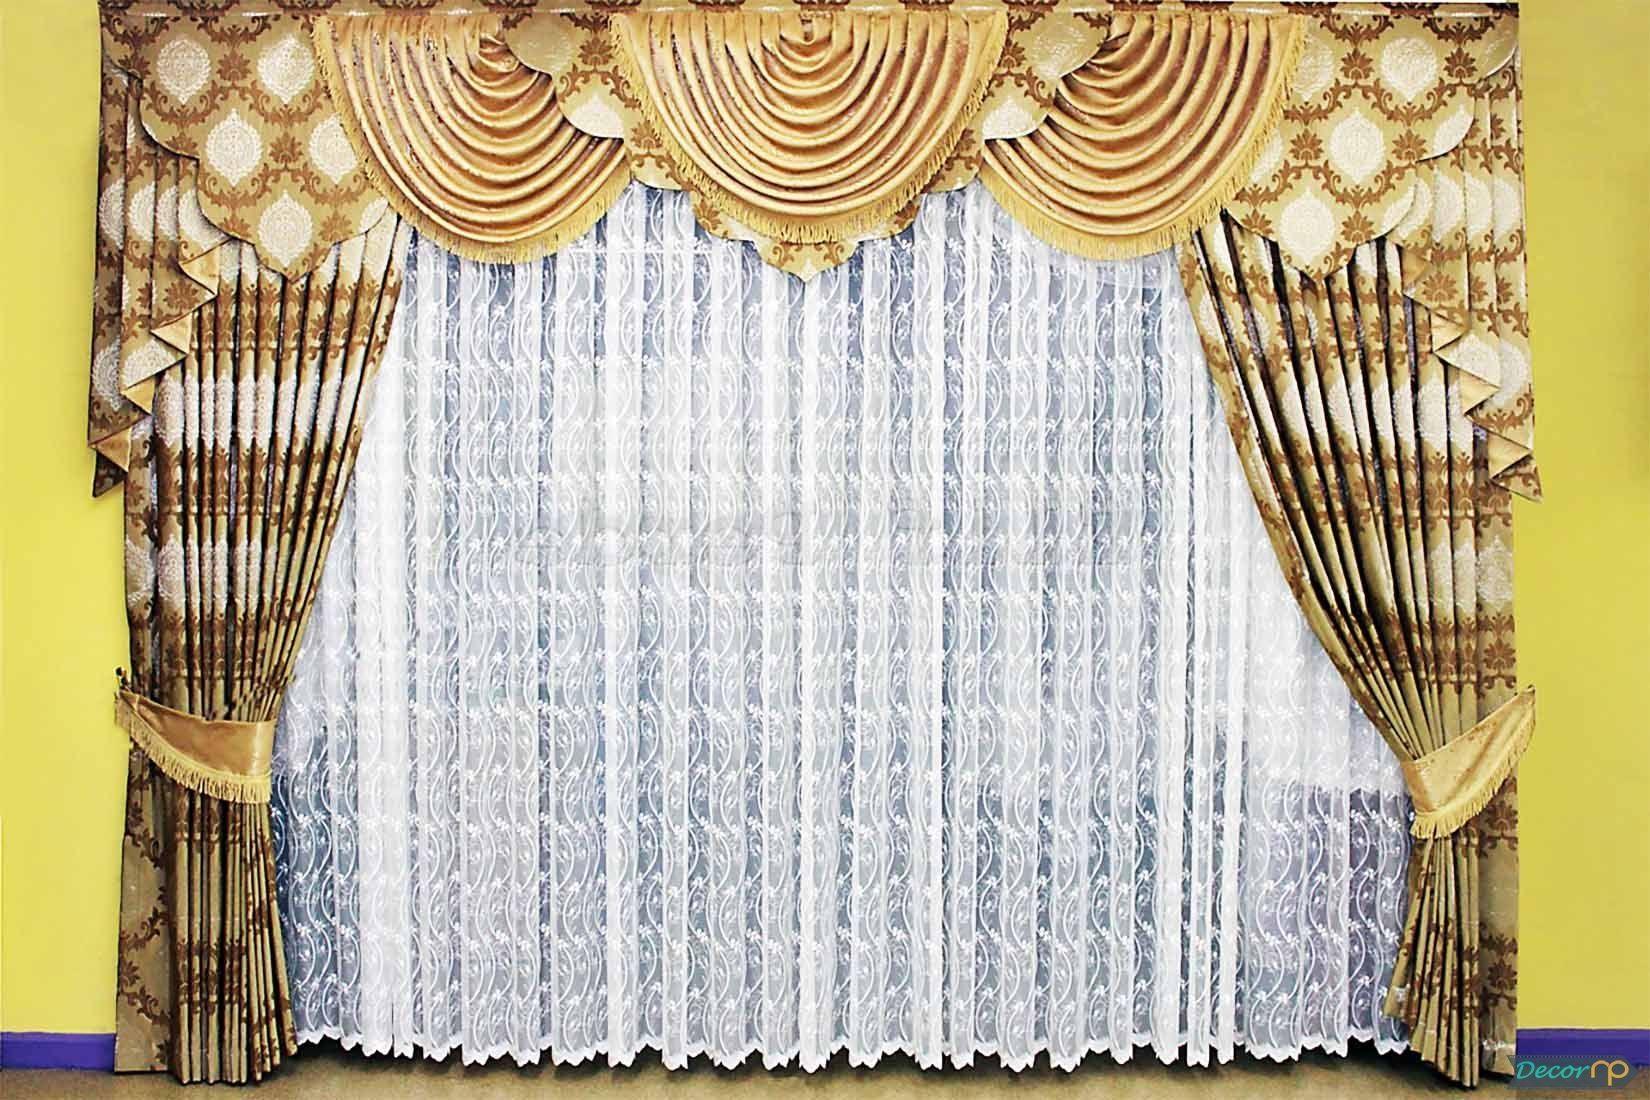 30 Very Stylish Living Room Curtain Models Curtaindesign2018 CurtainsIdeasForBedroom